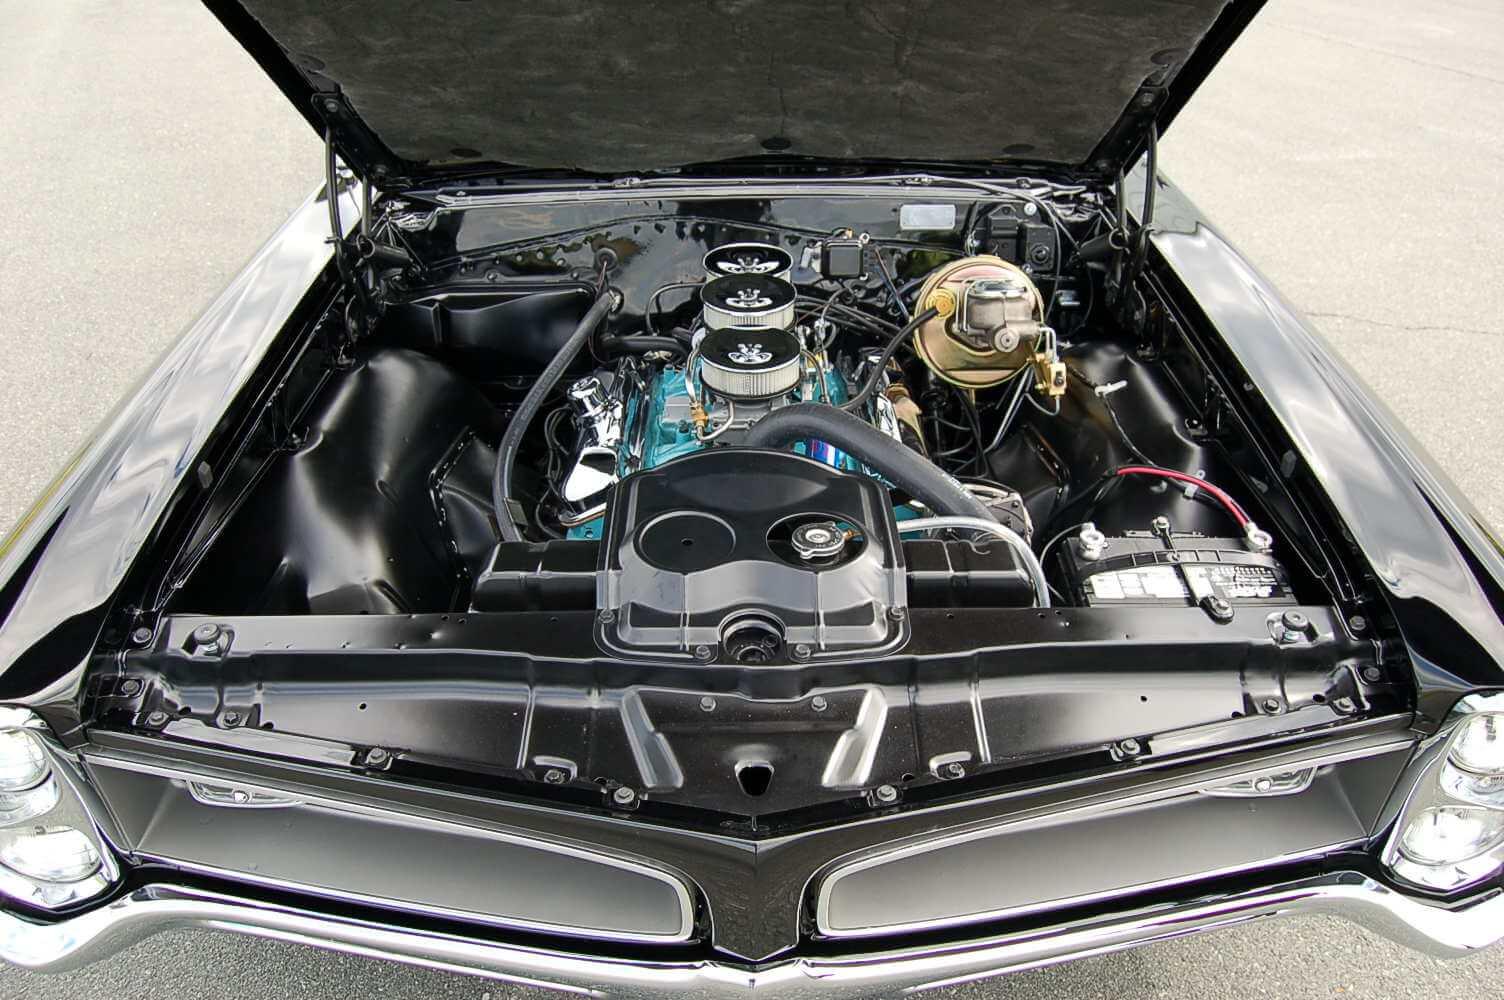 1966 GTO Restored Engine.JPG